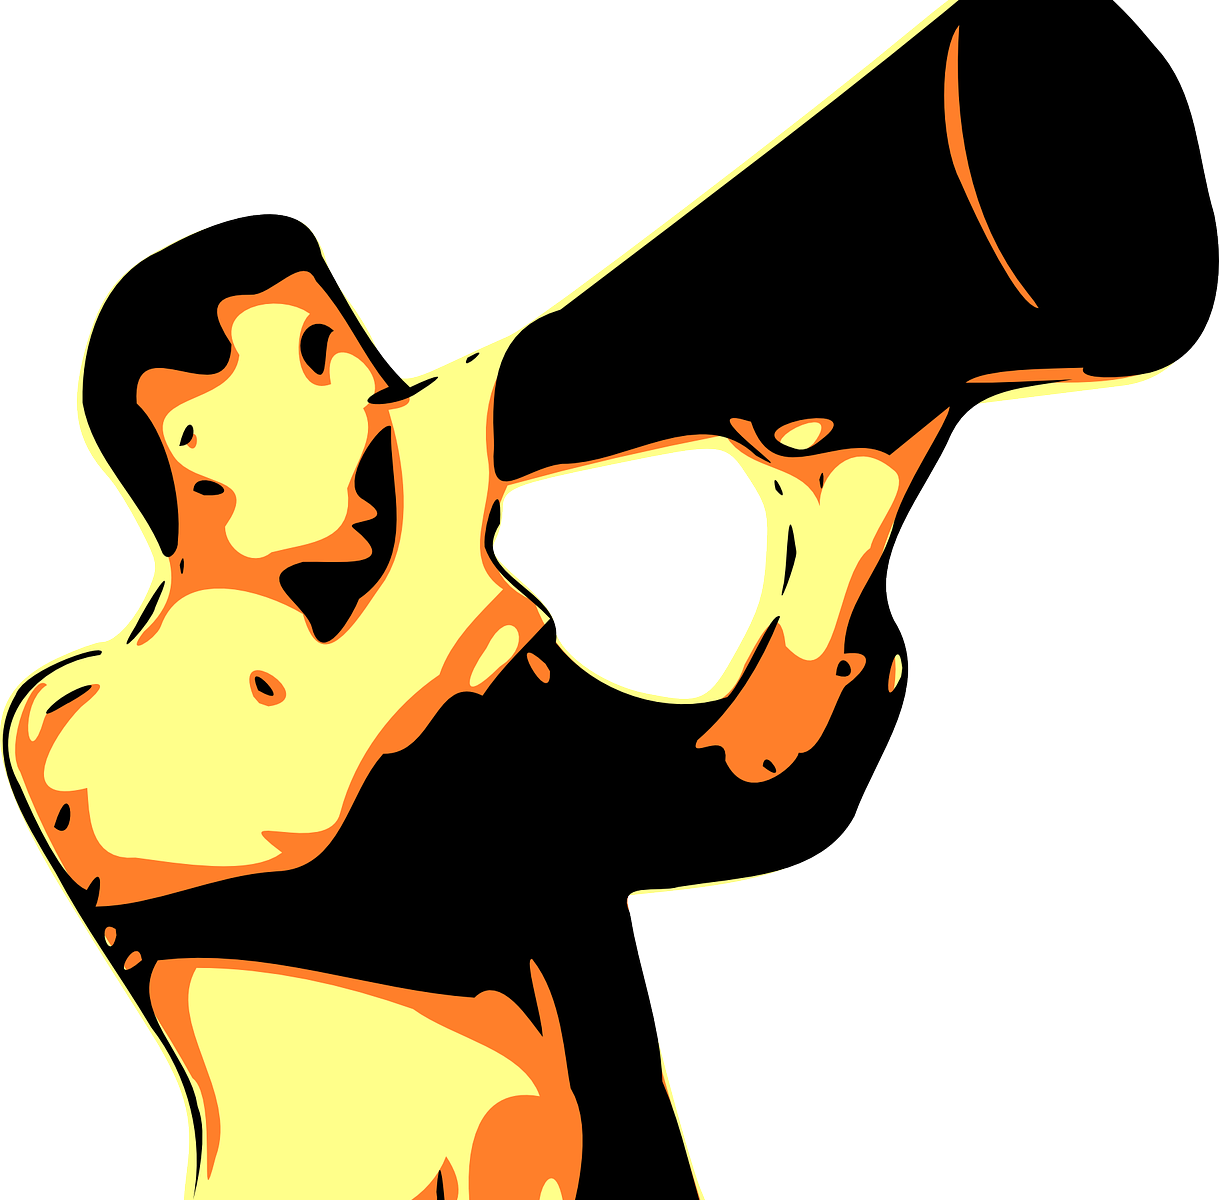 Quelle: https://pixabay.com/de/megaphon-schreien-stimme-laut-mann-150254/